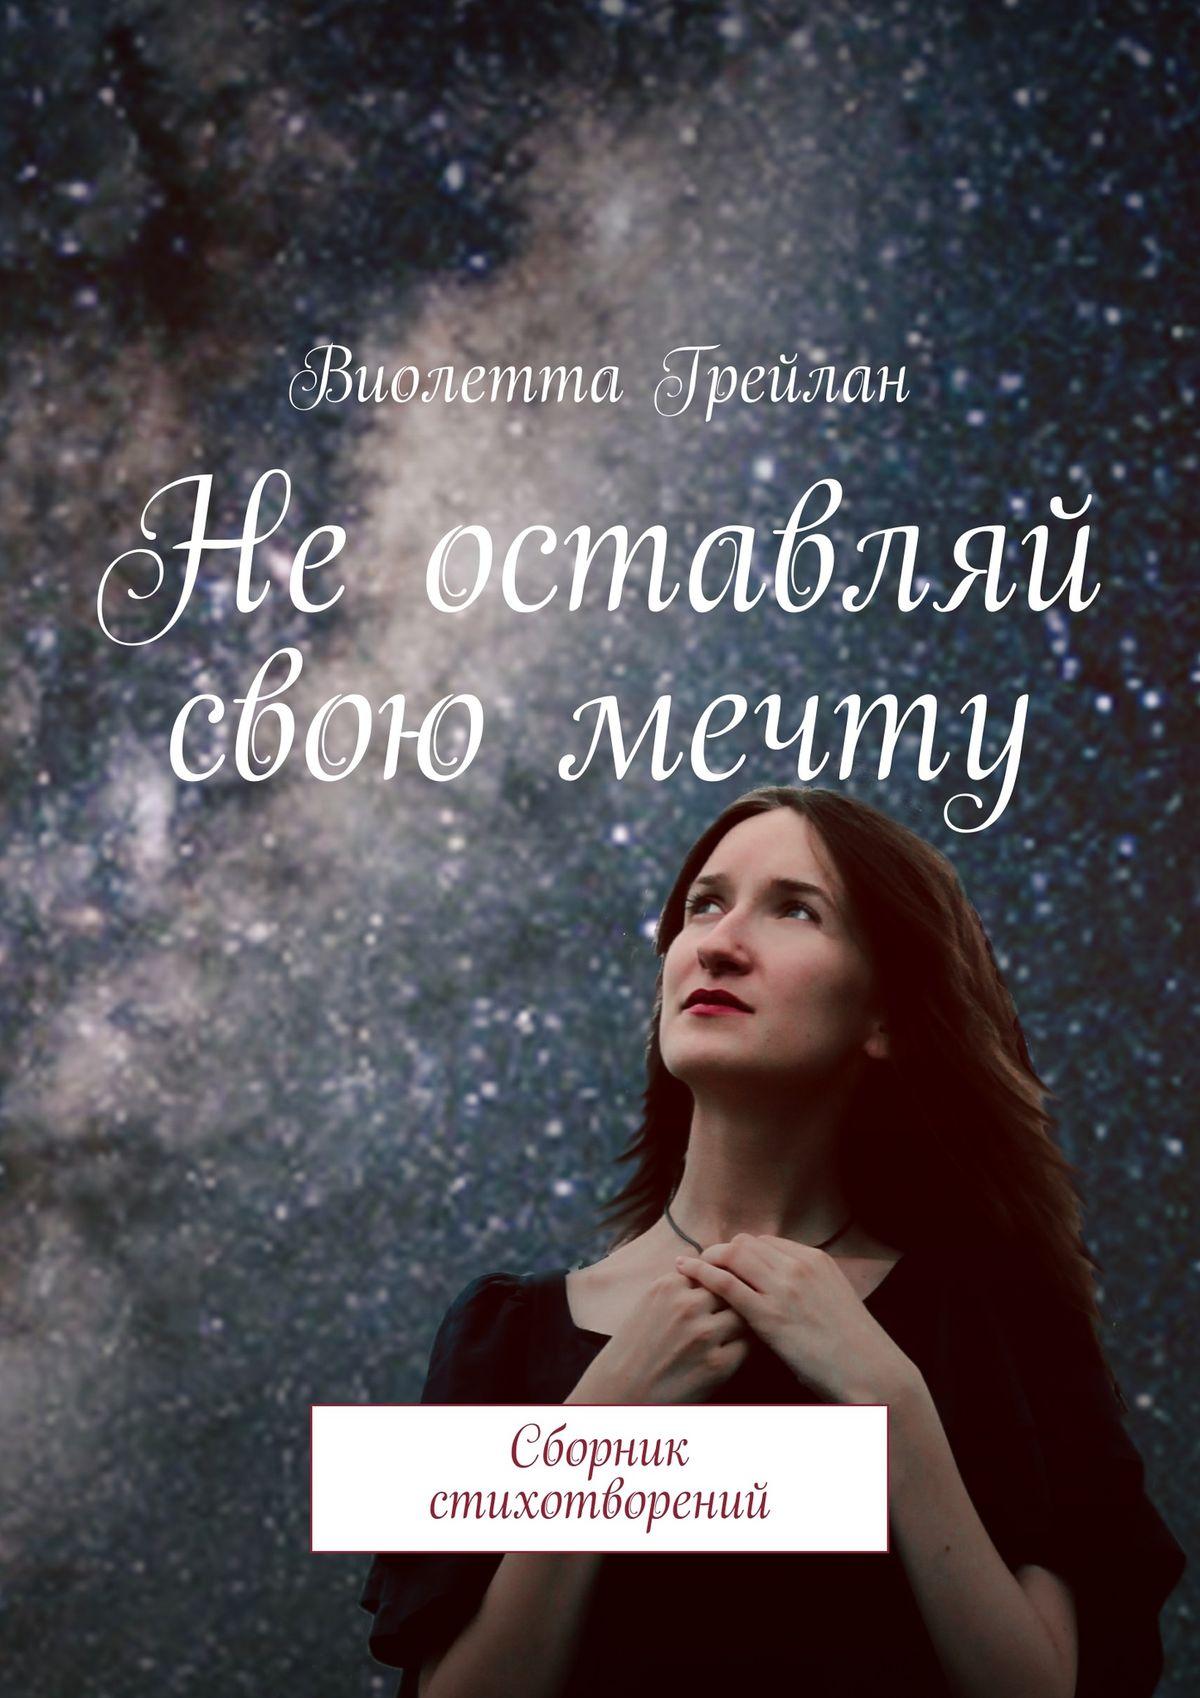 Виолетта Грейлан Неоставляй свою мечту. Сборник стихотворений кровать виолетта f806